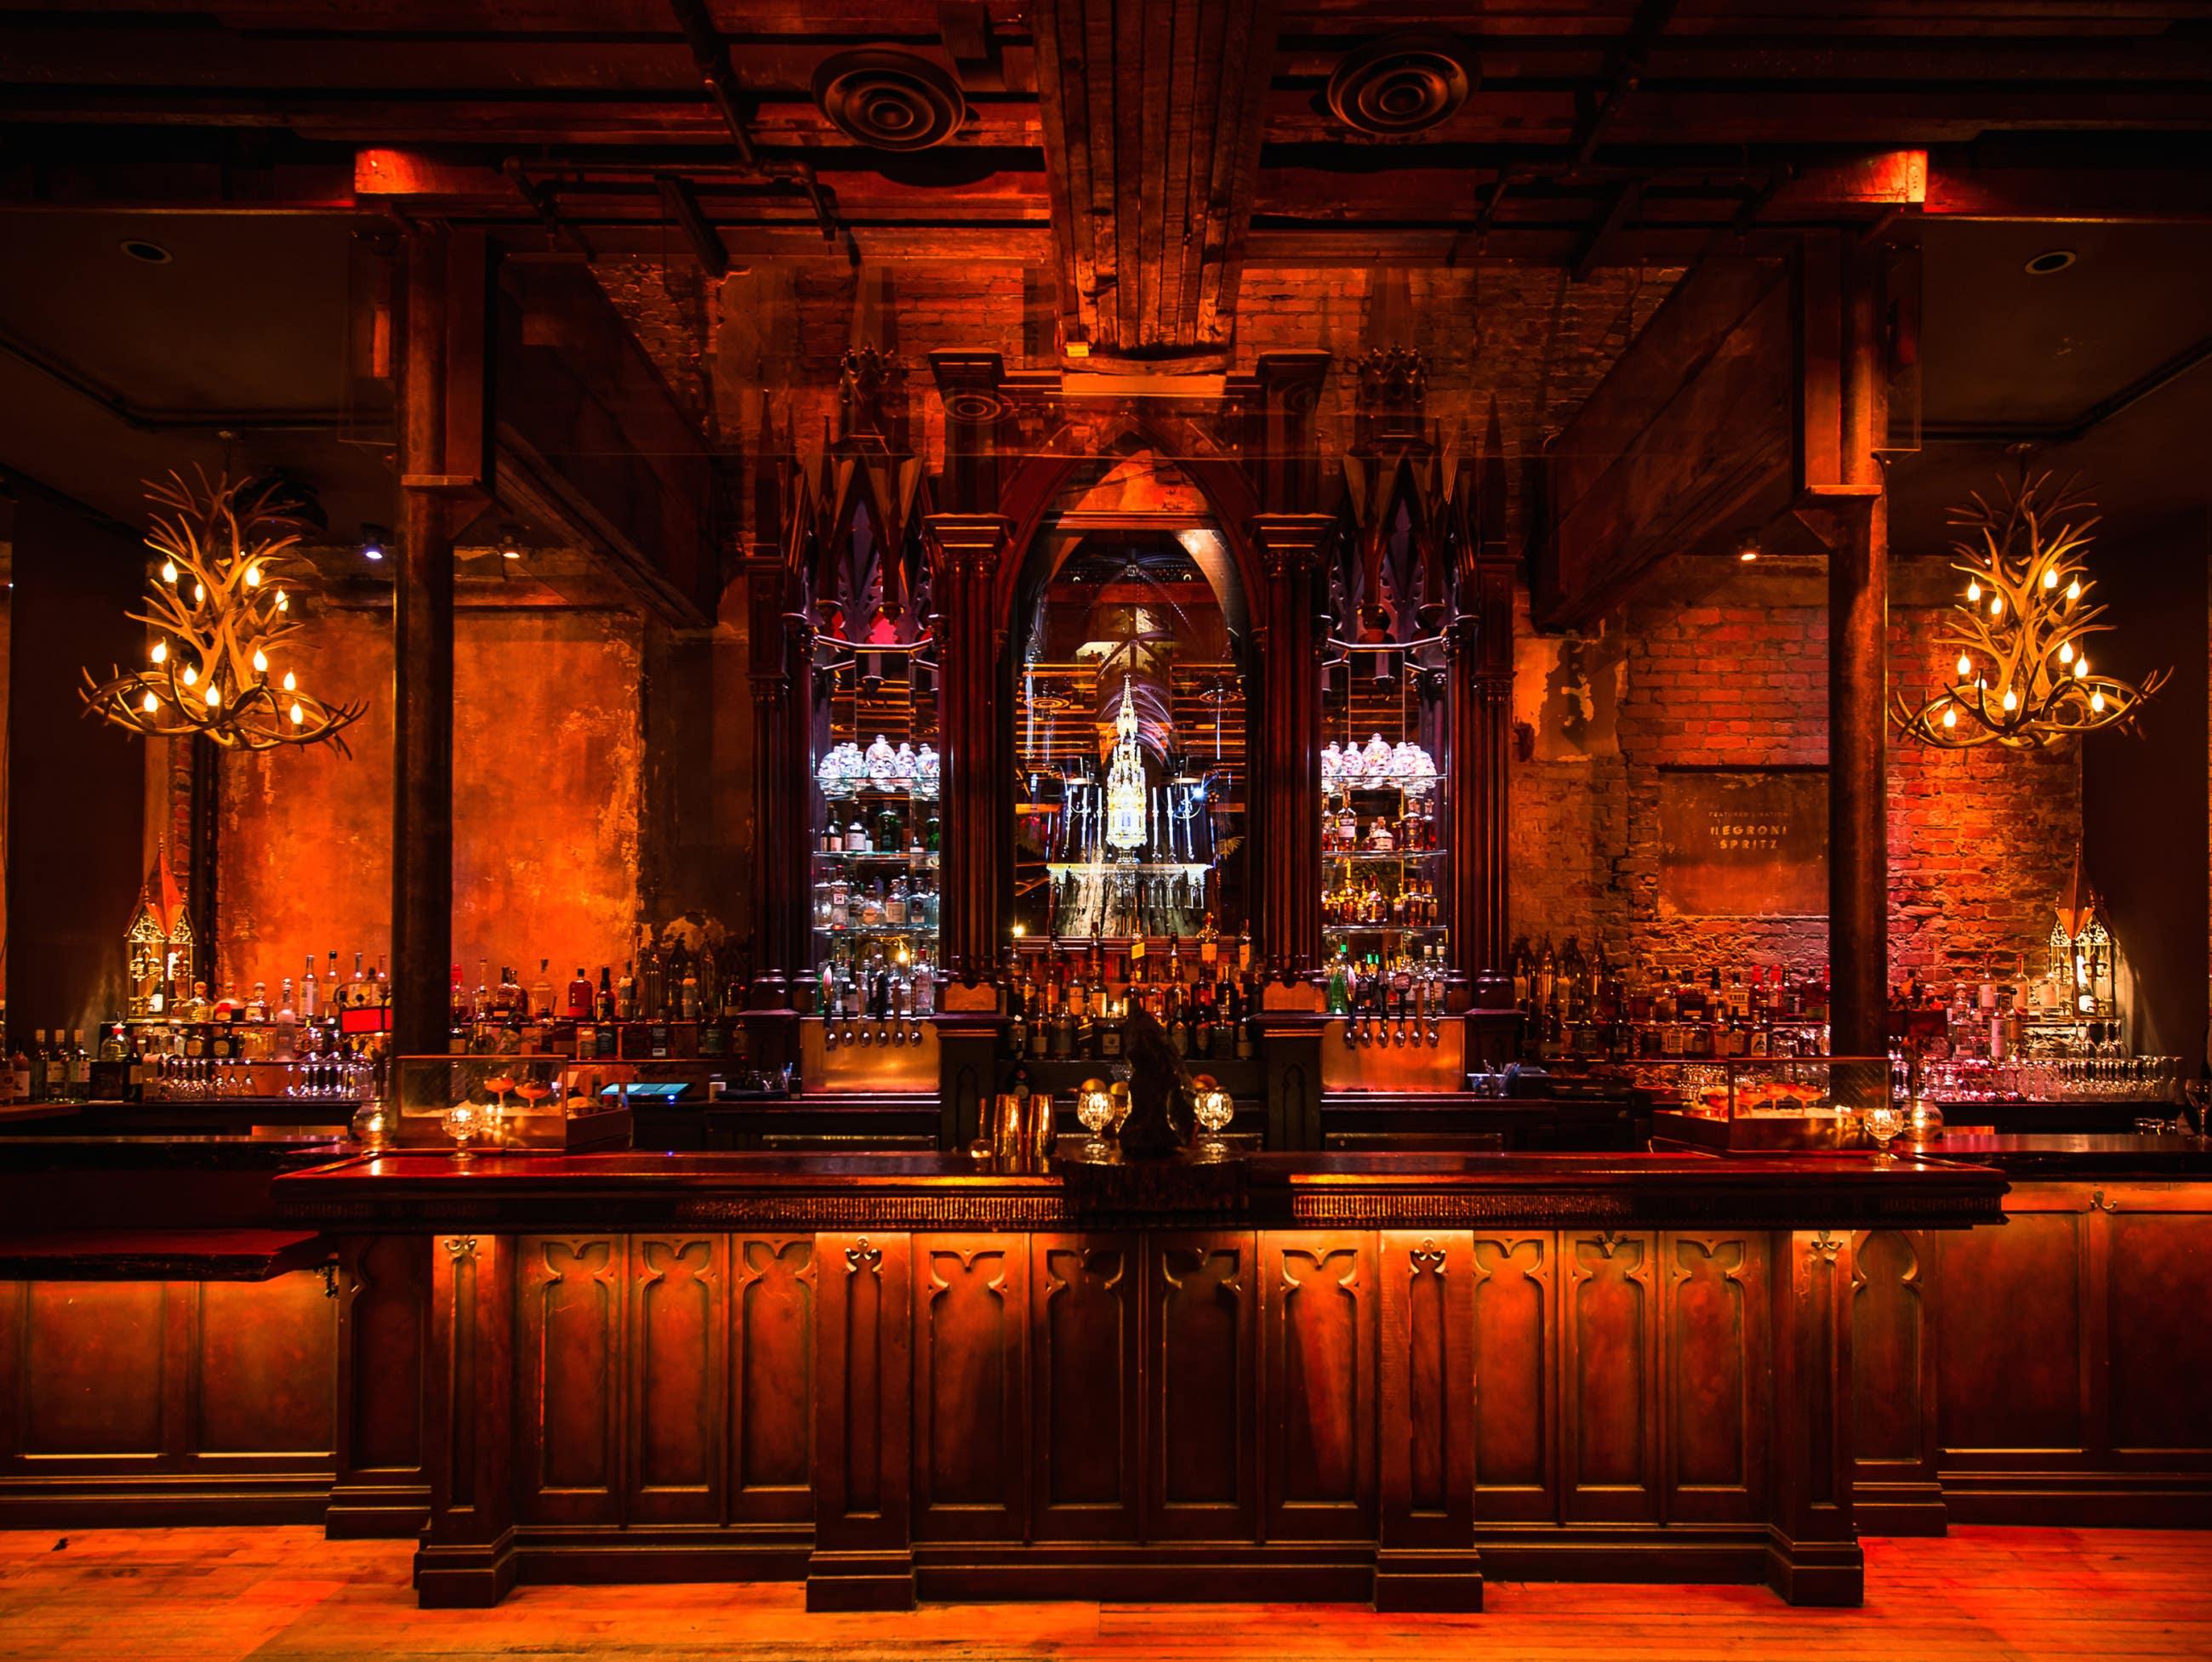 Gothic Bar at Clifton's Republic